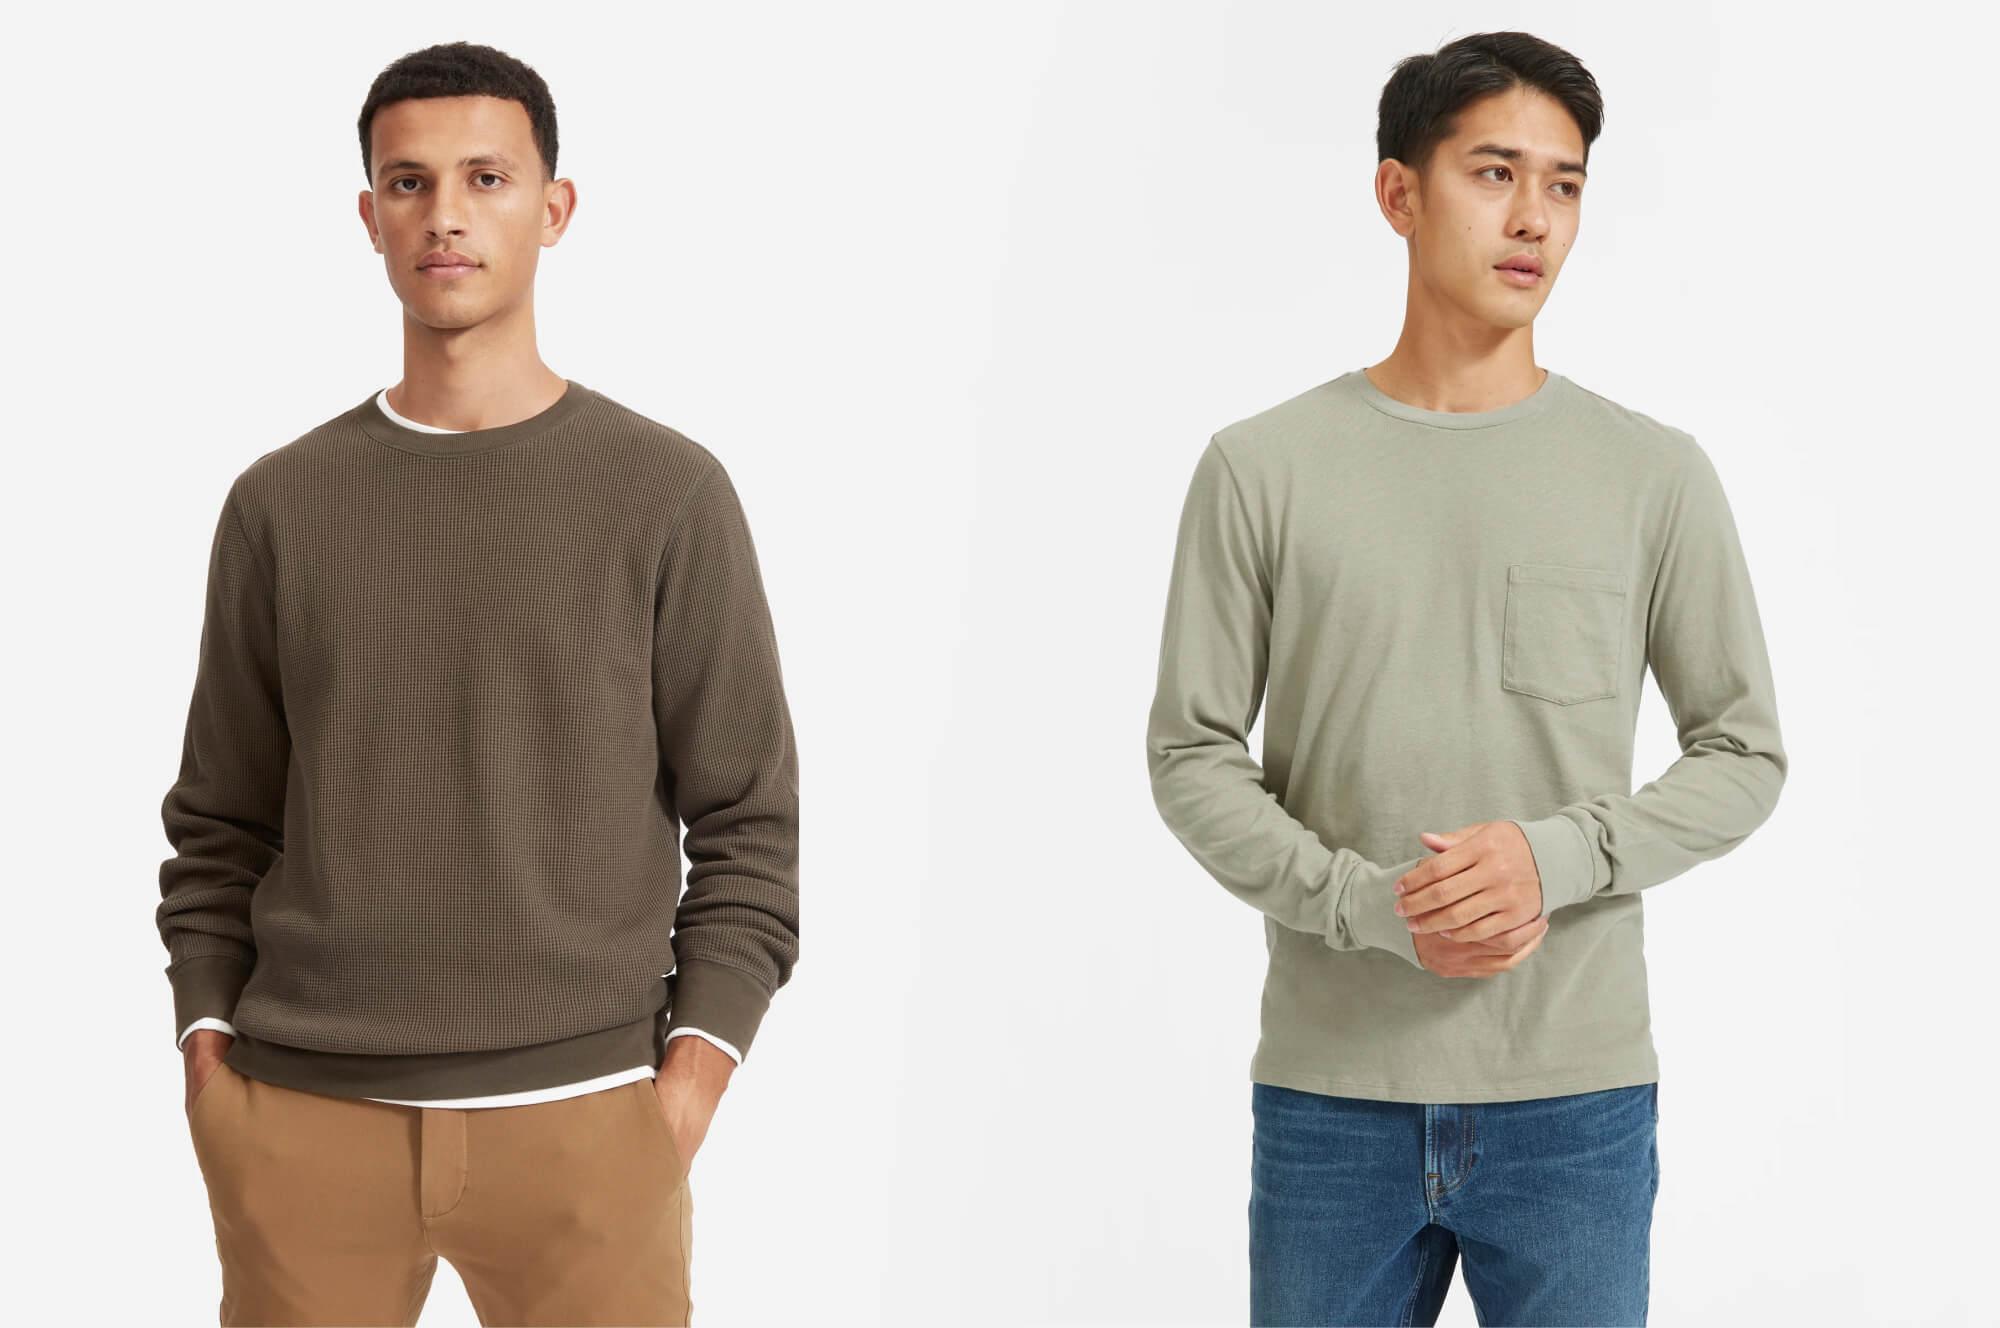 Mens minimalist fashion